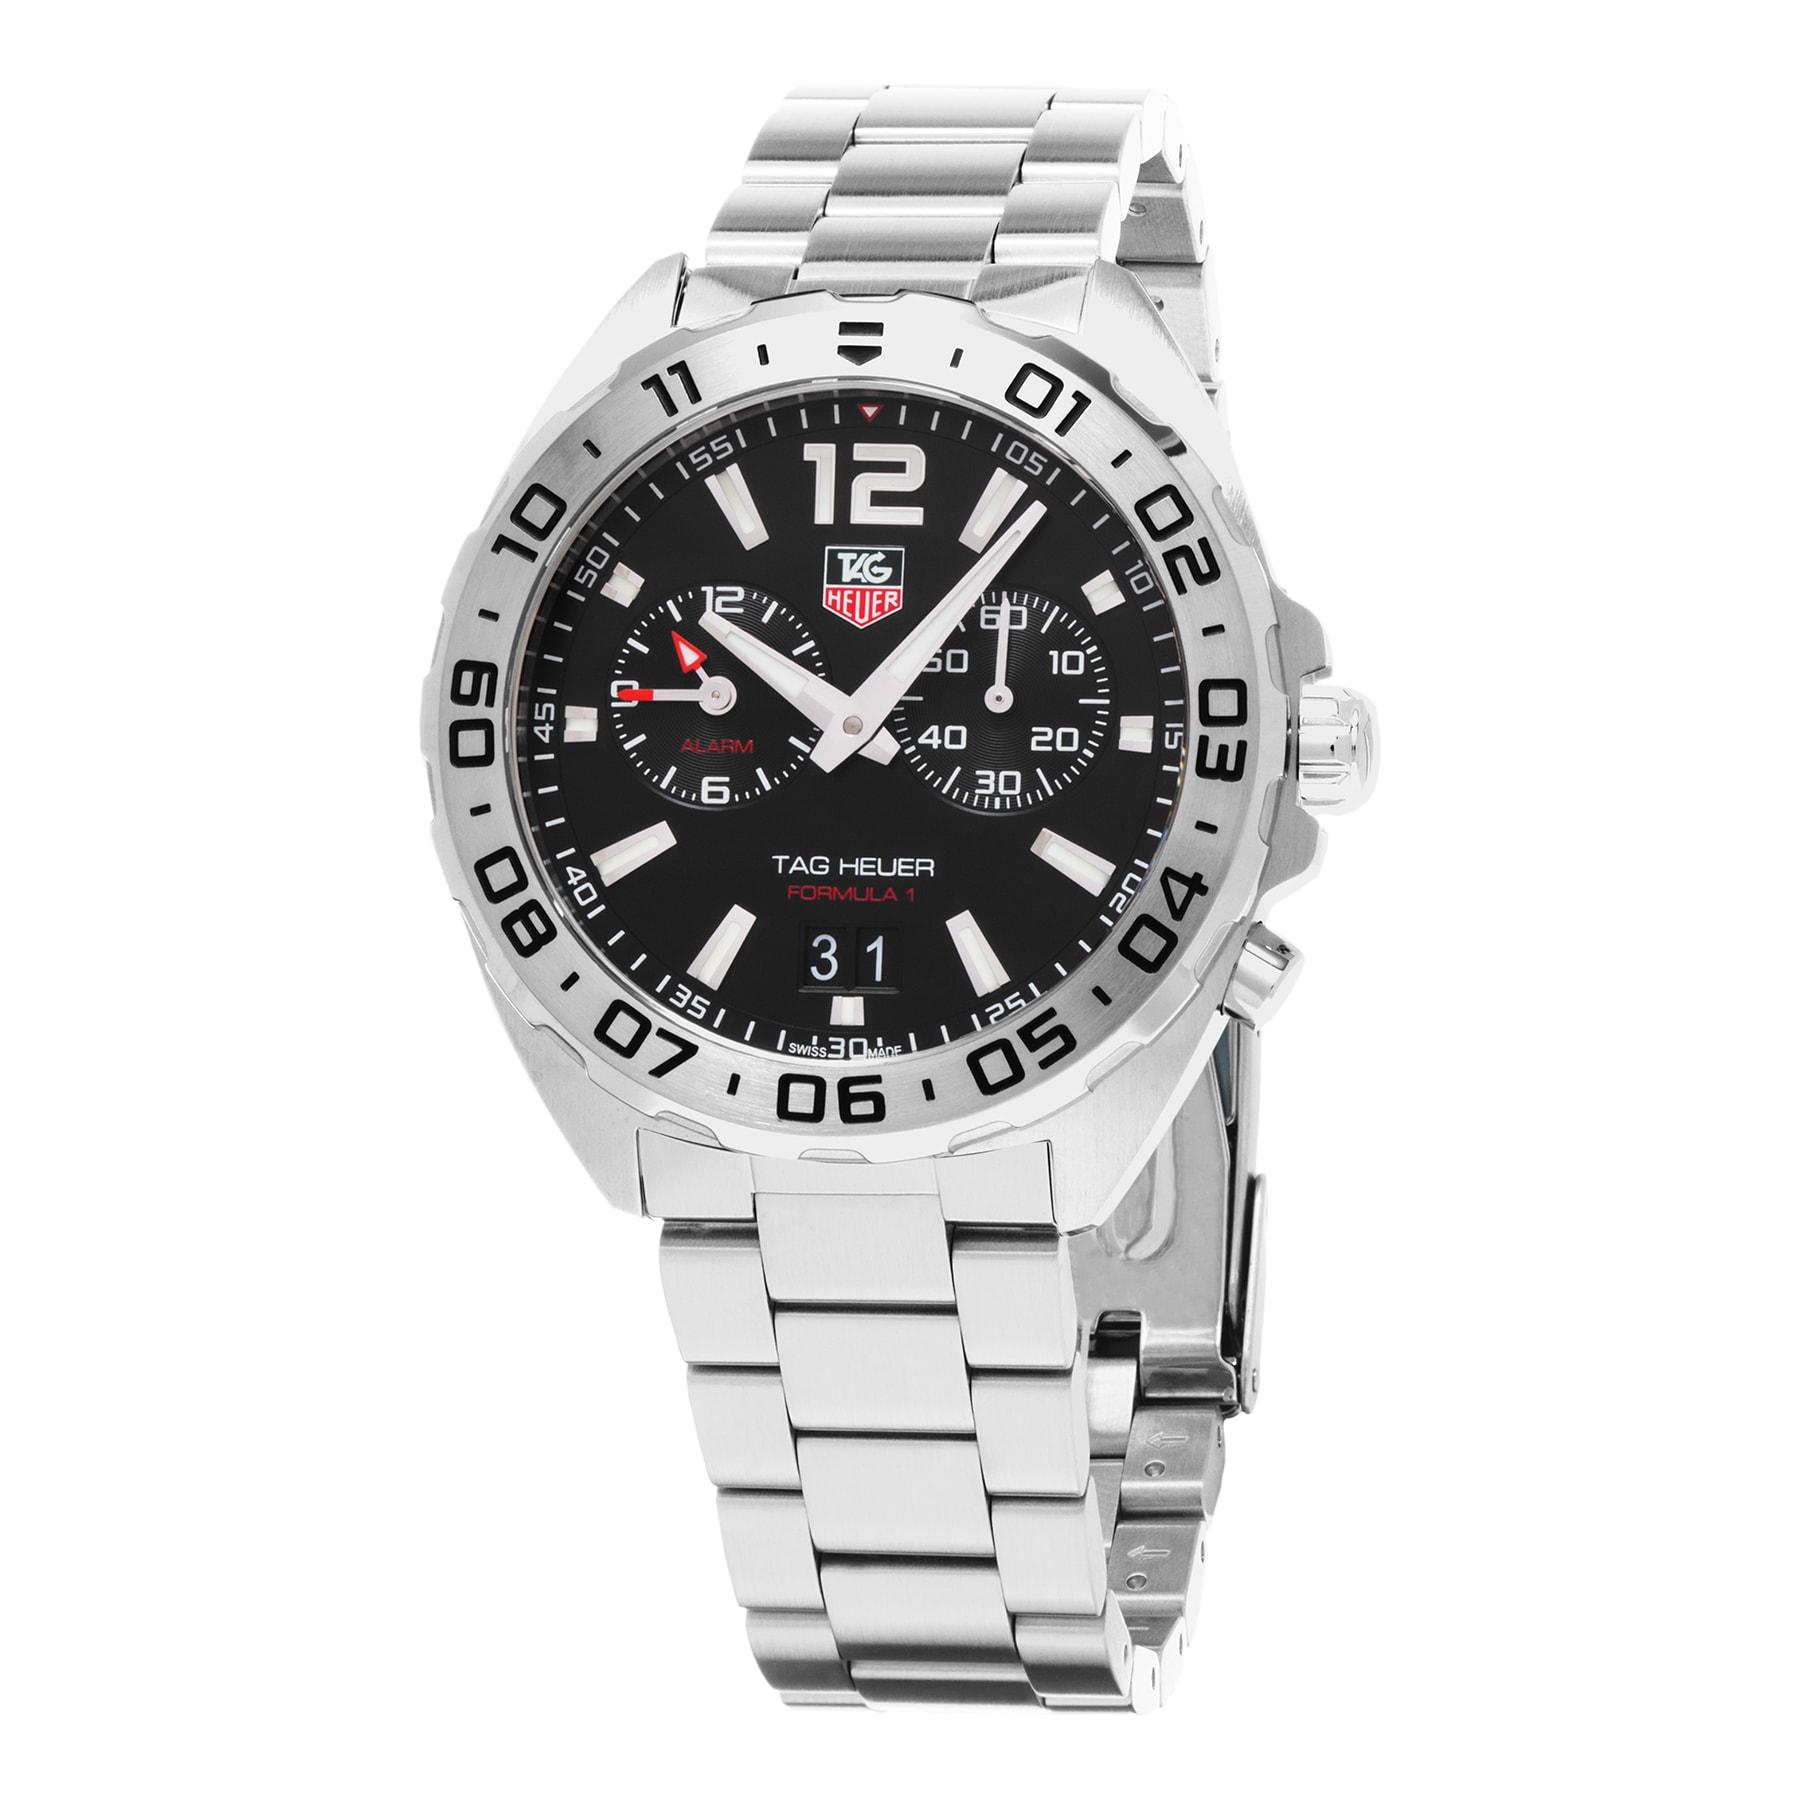 fea76424c7b7 Shop Tag Heuer Men s WAZ111A.BA0875  Formula 1  Black Dial Stainless Steel  Alarm Swiss Quartz Watch - Free Shipping Today - Overstock - 10436359